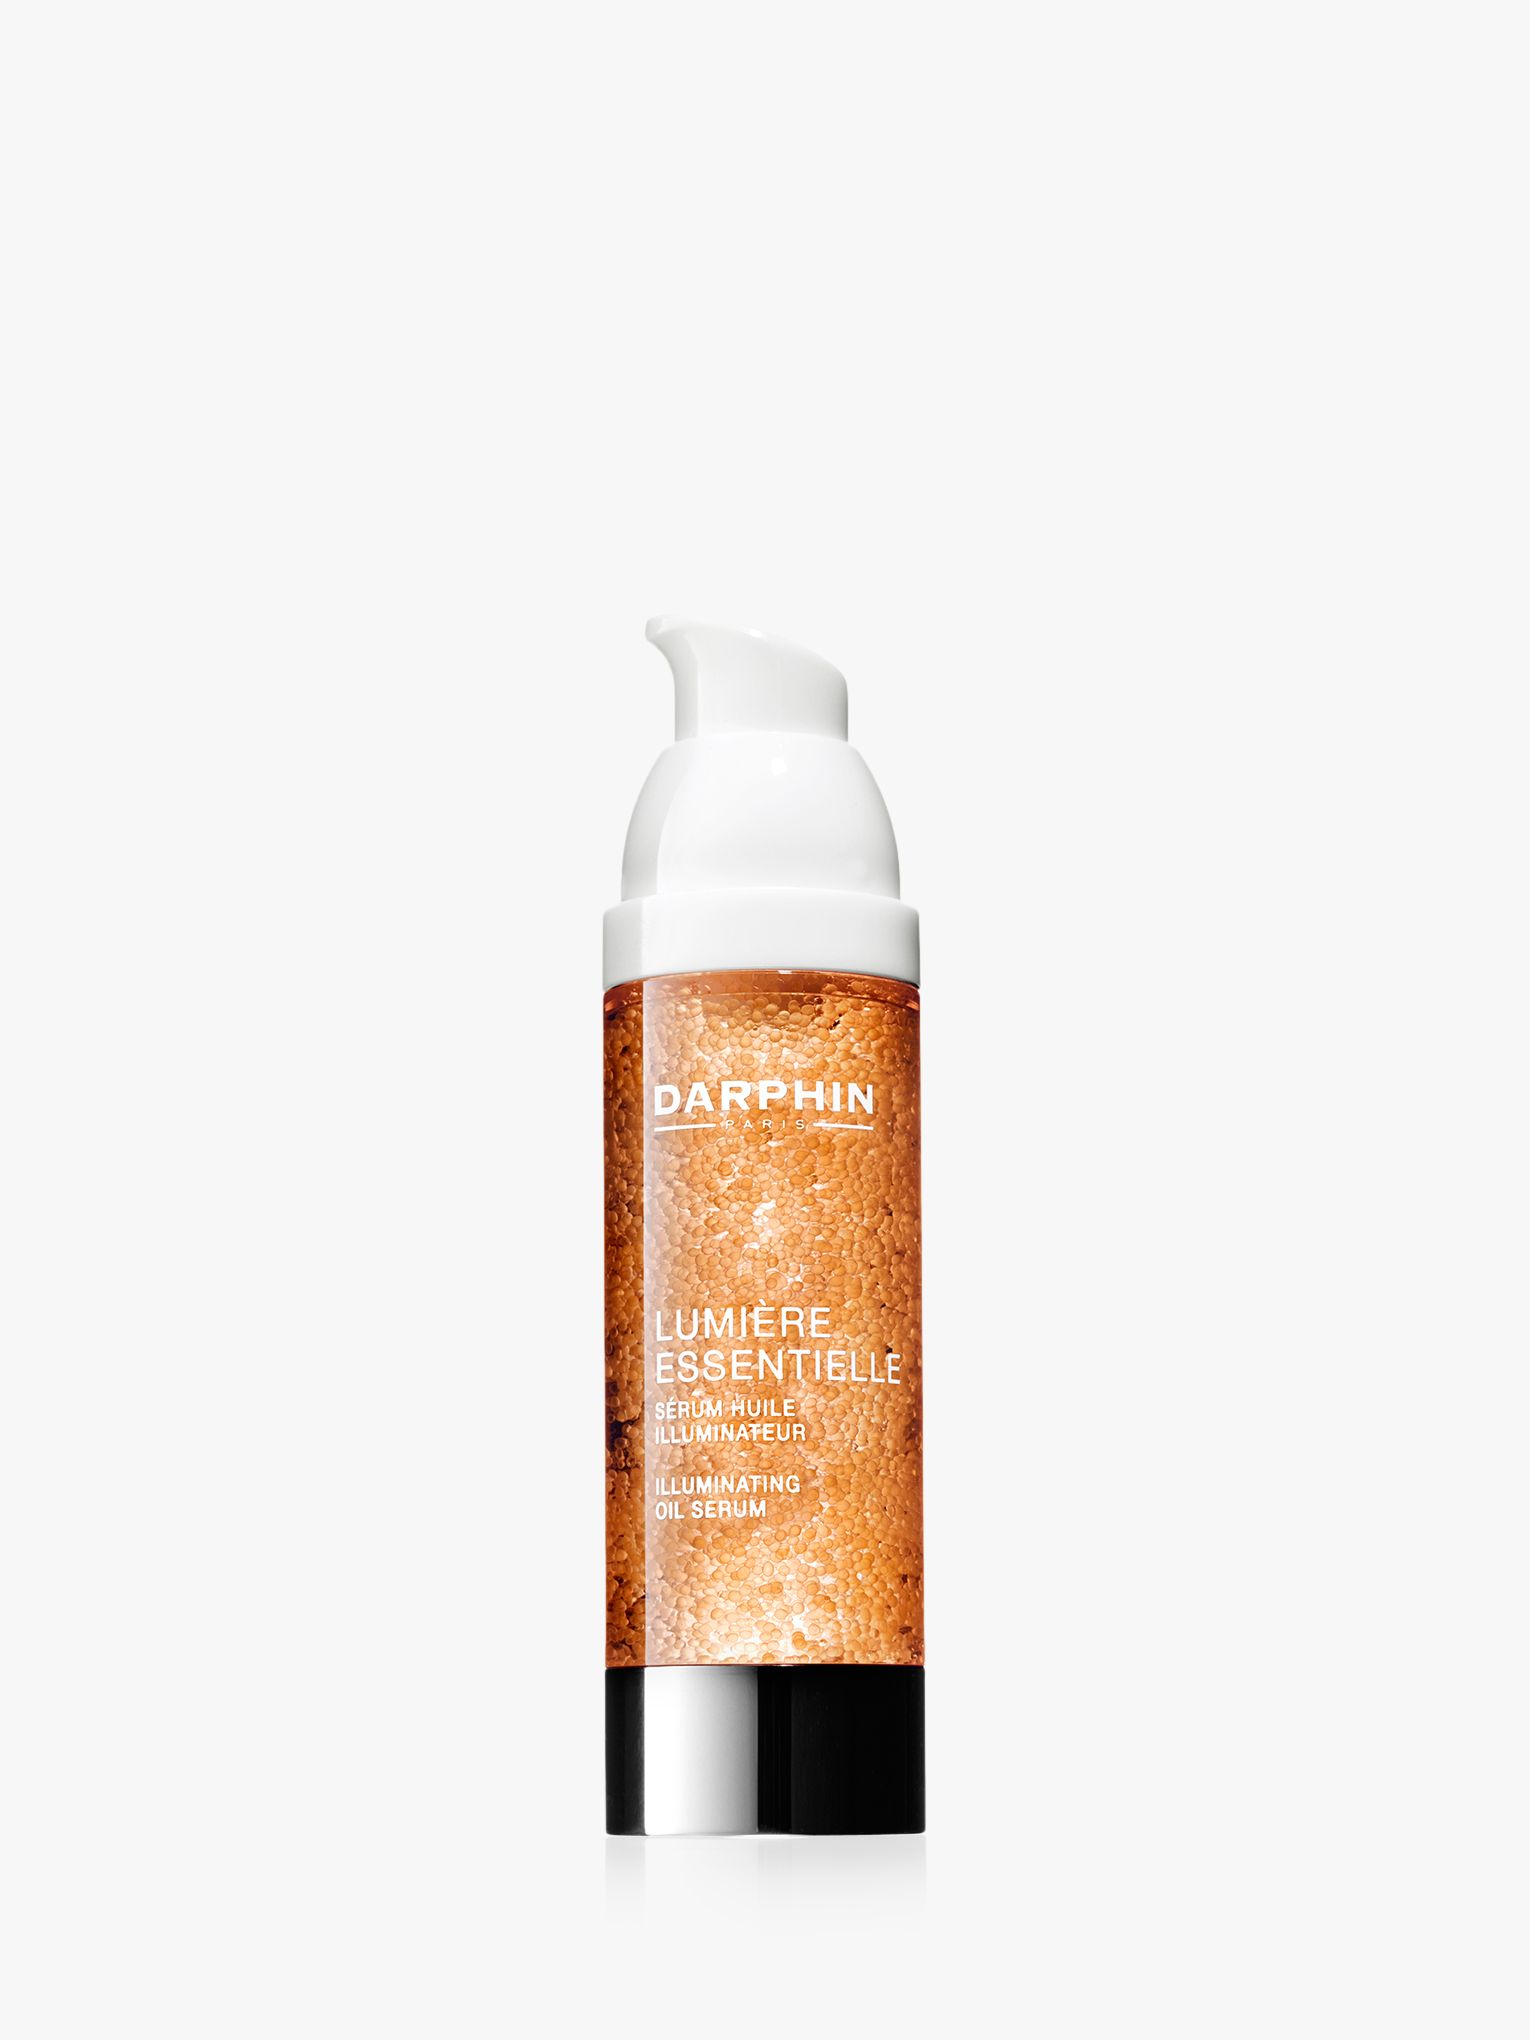 Darphin Darphin Lumiere Essentielle Illuminating Oil Serum, 30ml